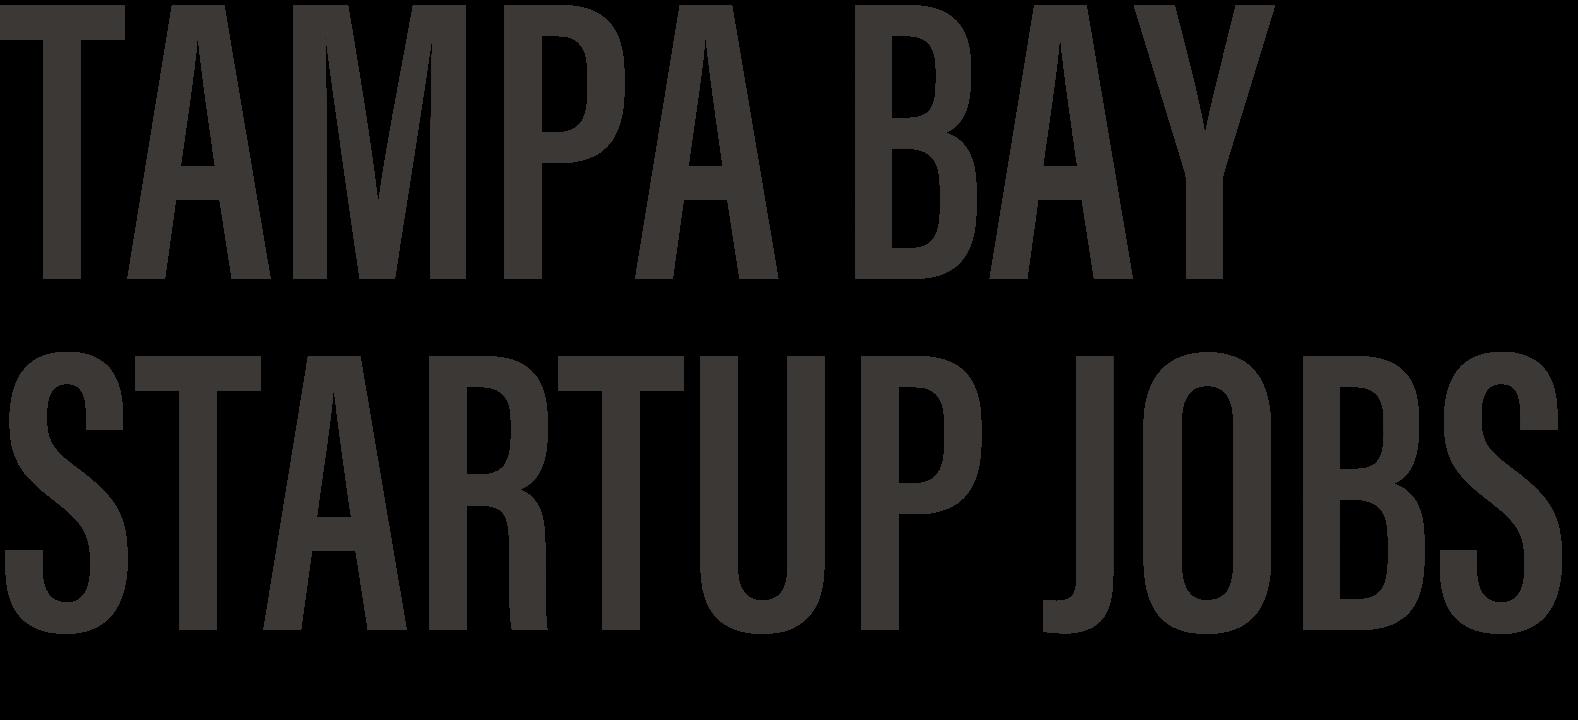 Tampa Bay Startup Jobs